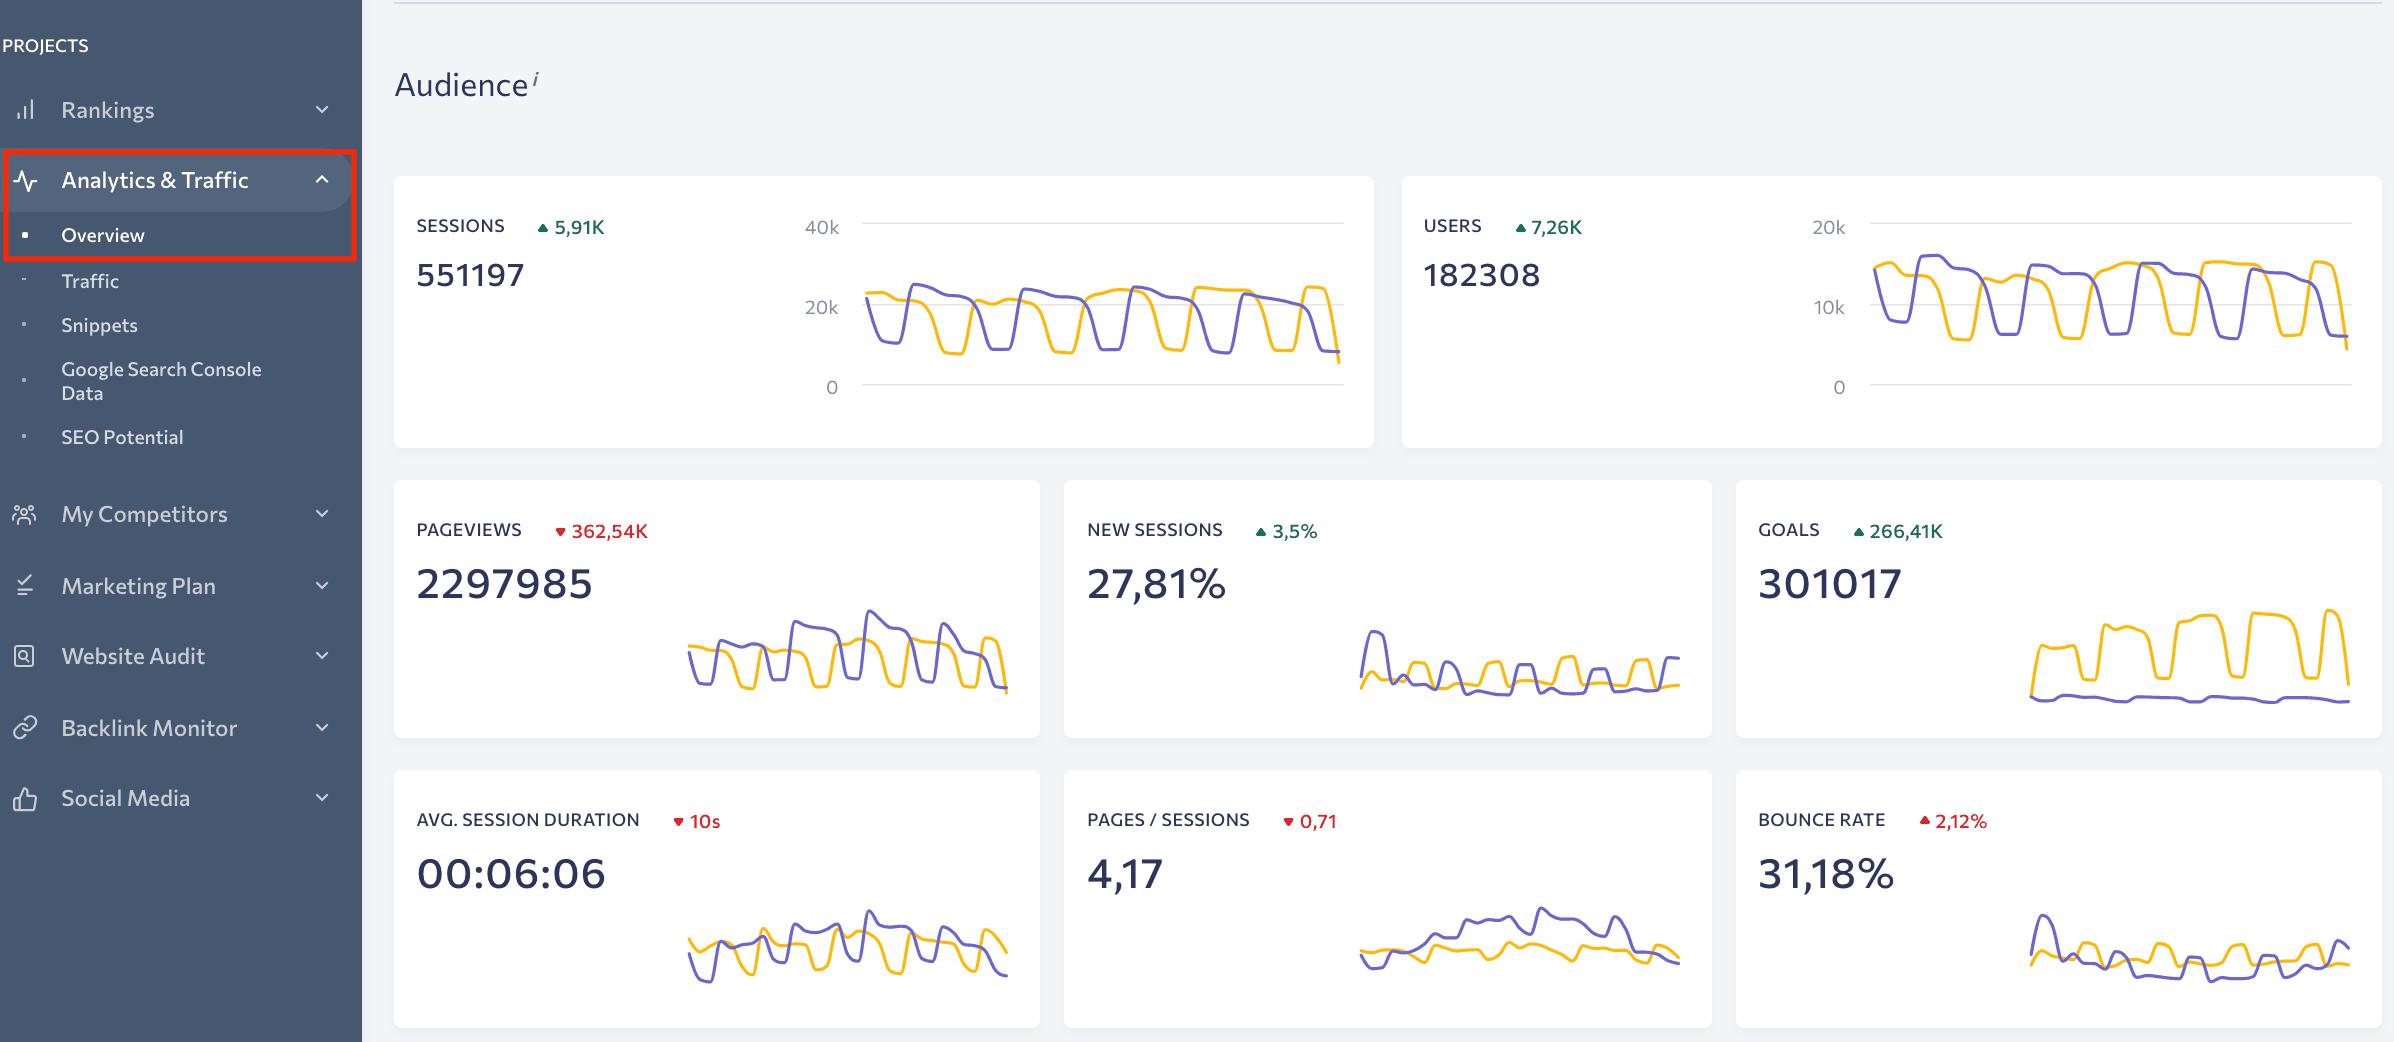 Analytics & Traffic Overview in SE Ranking